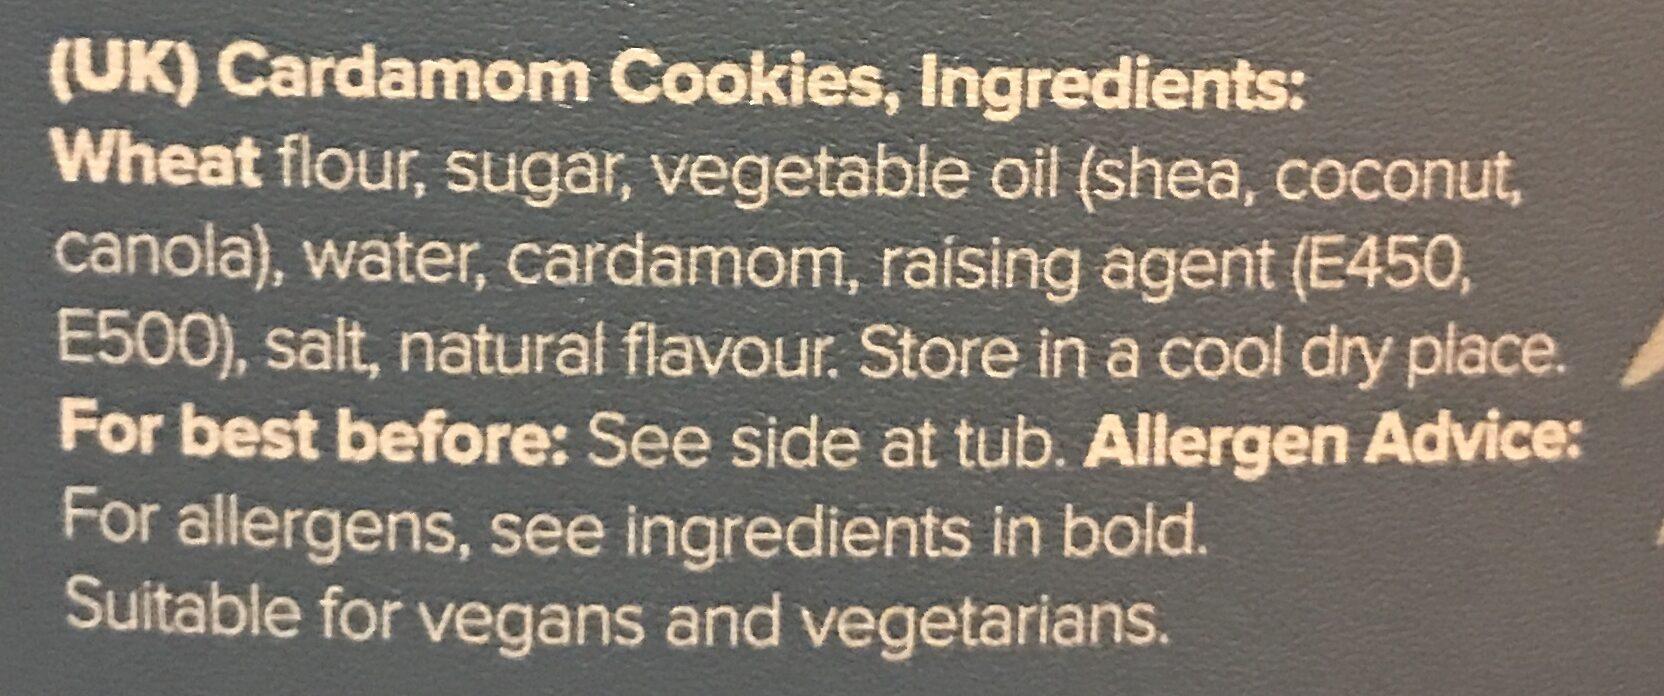 Kardemumma skorpor - Ingredients - en